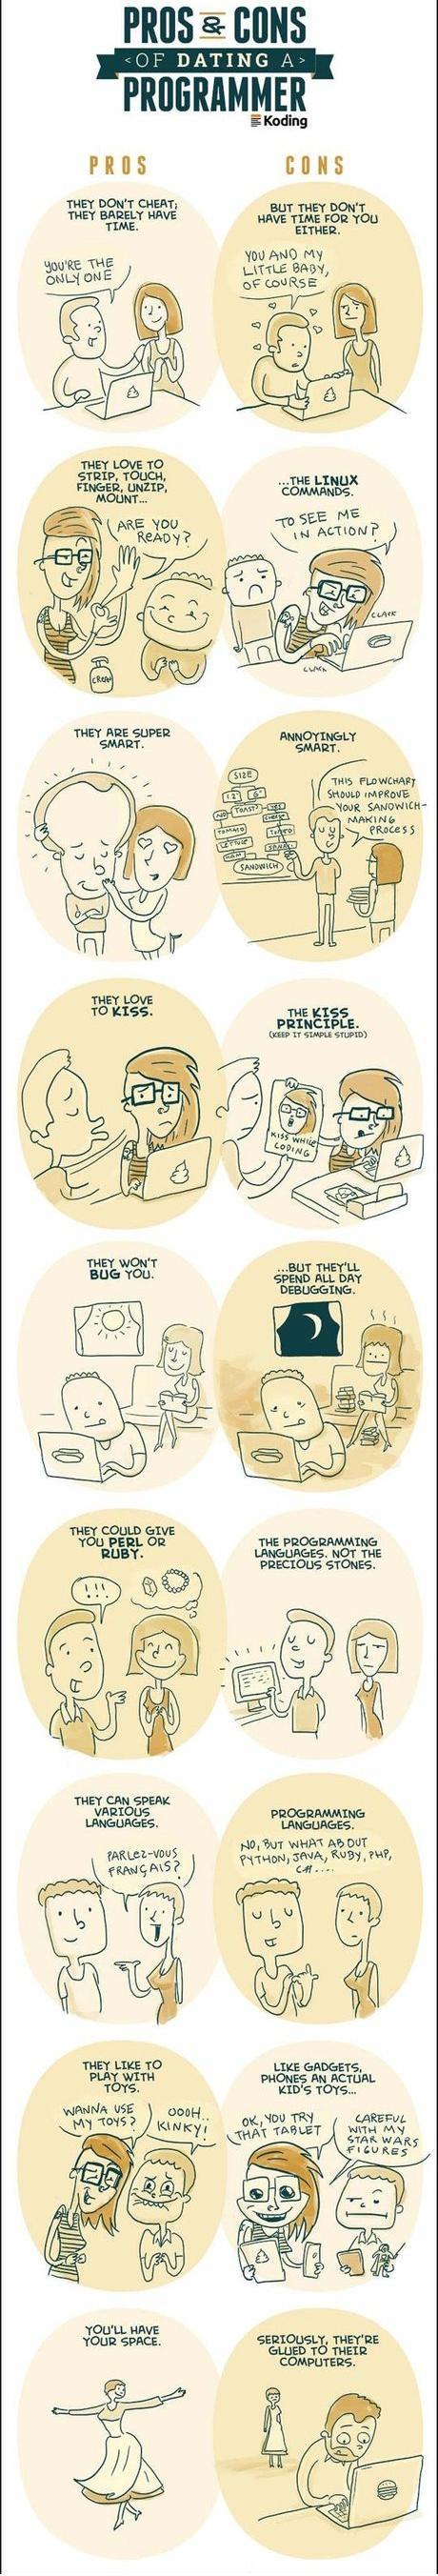 programming dating